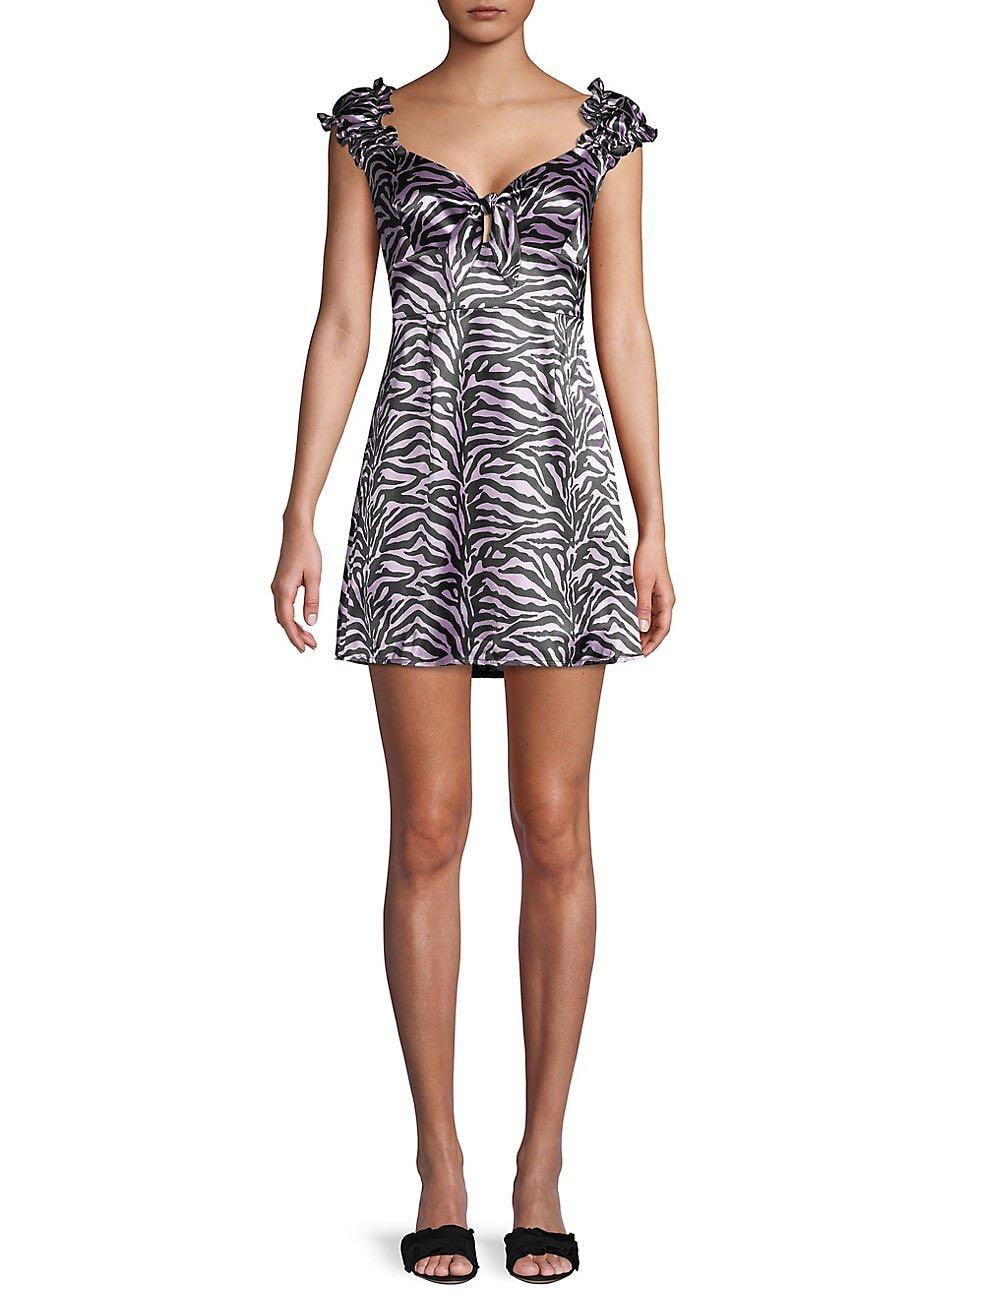 Satin Zebra Print Mini Dress